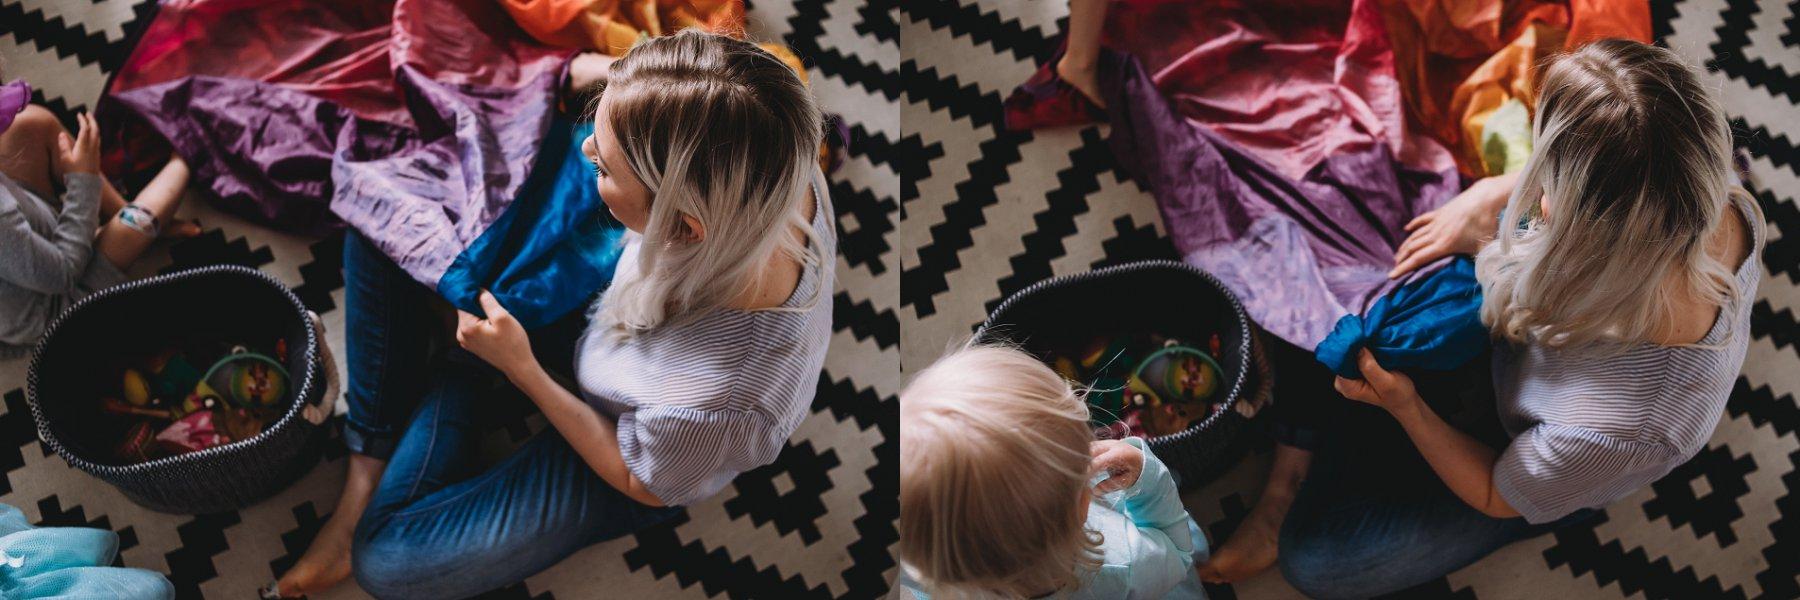 Documentary Lifestyle Motherhood Photography in Kansas City by Merry Ohler | Family Photographer Kansas City 12